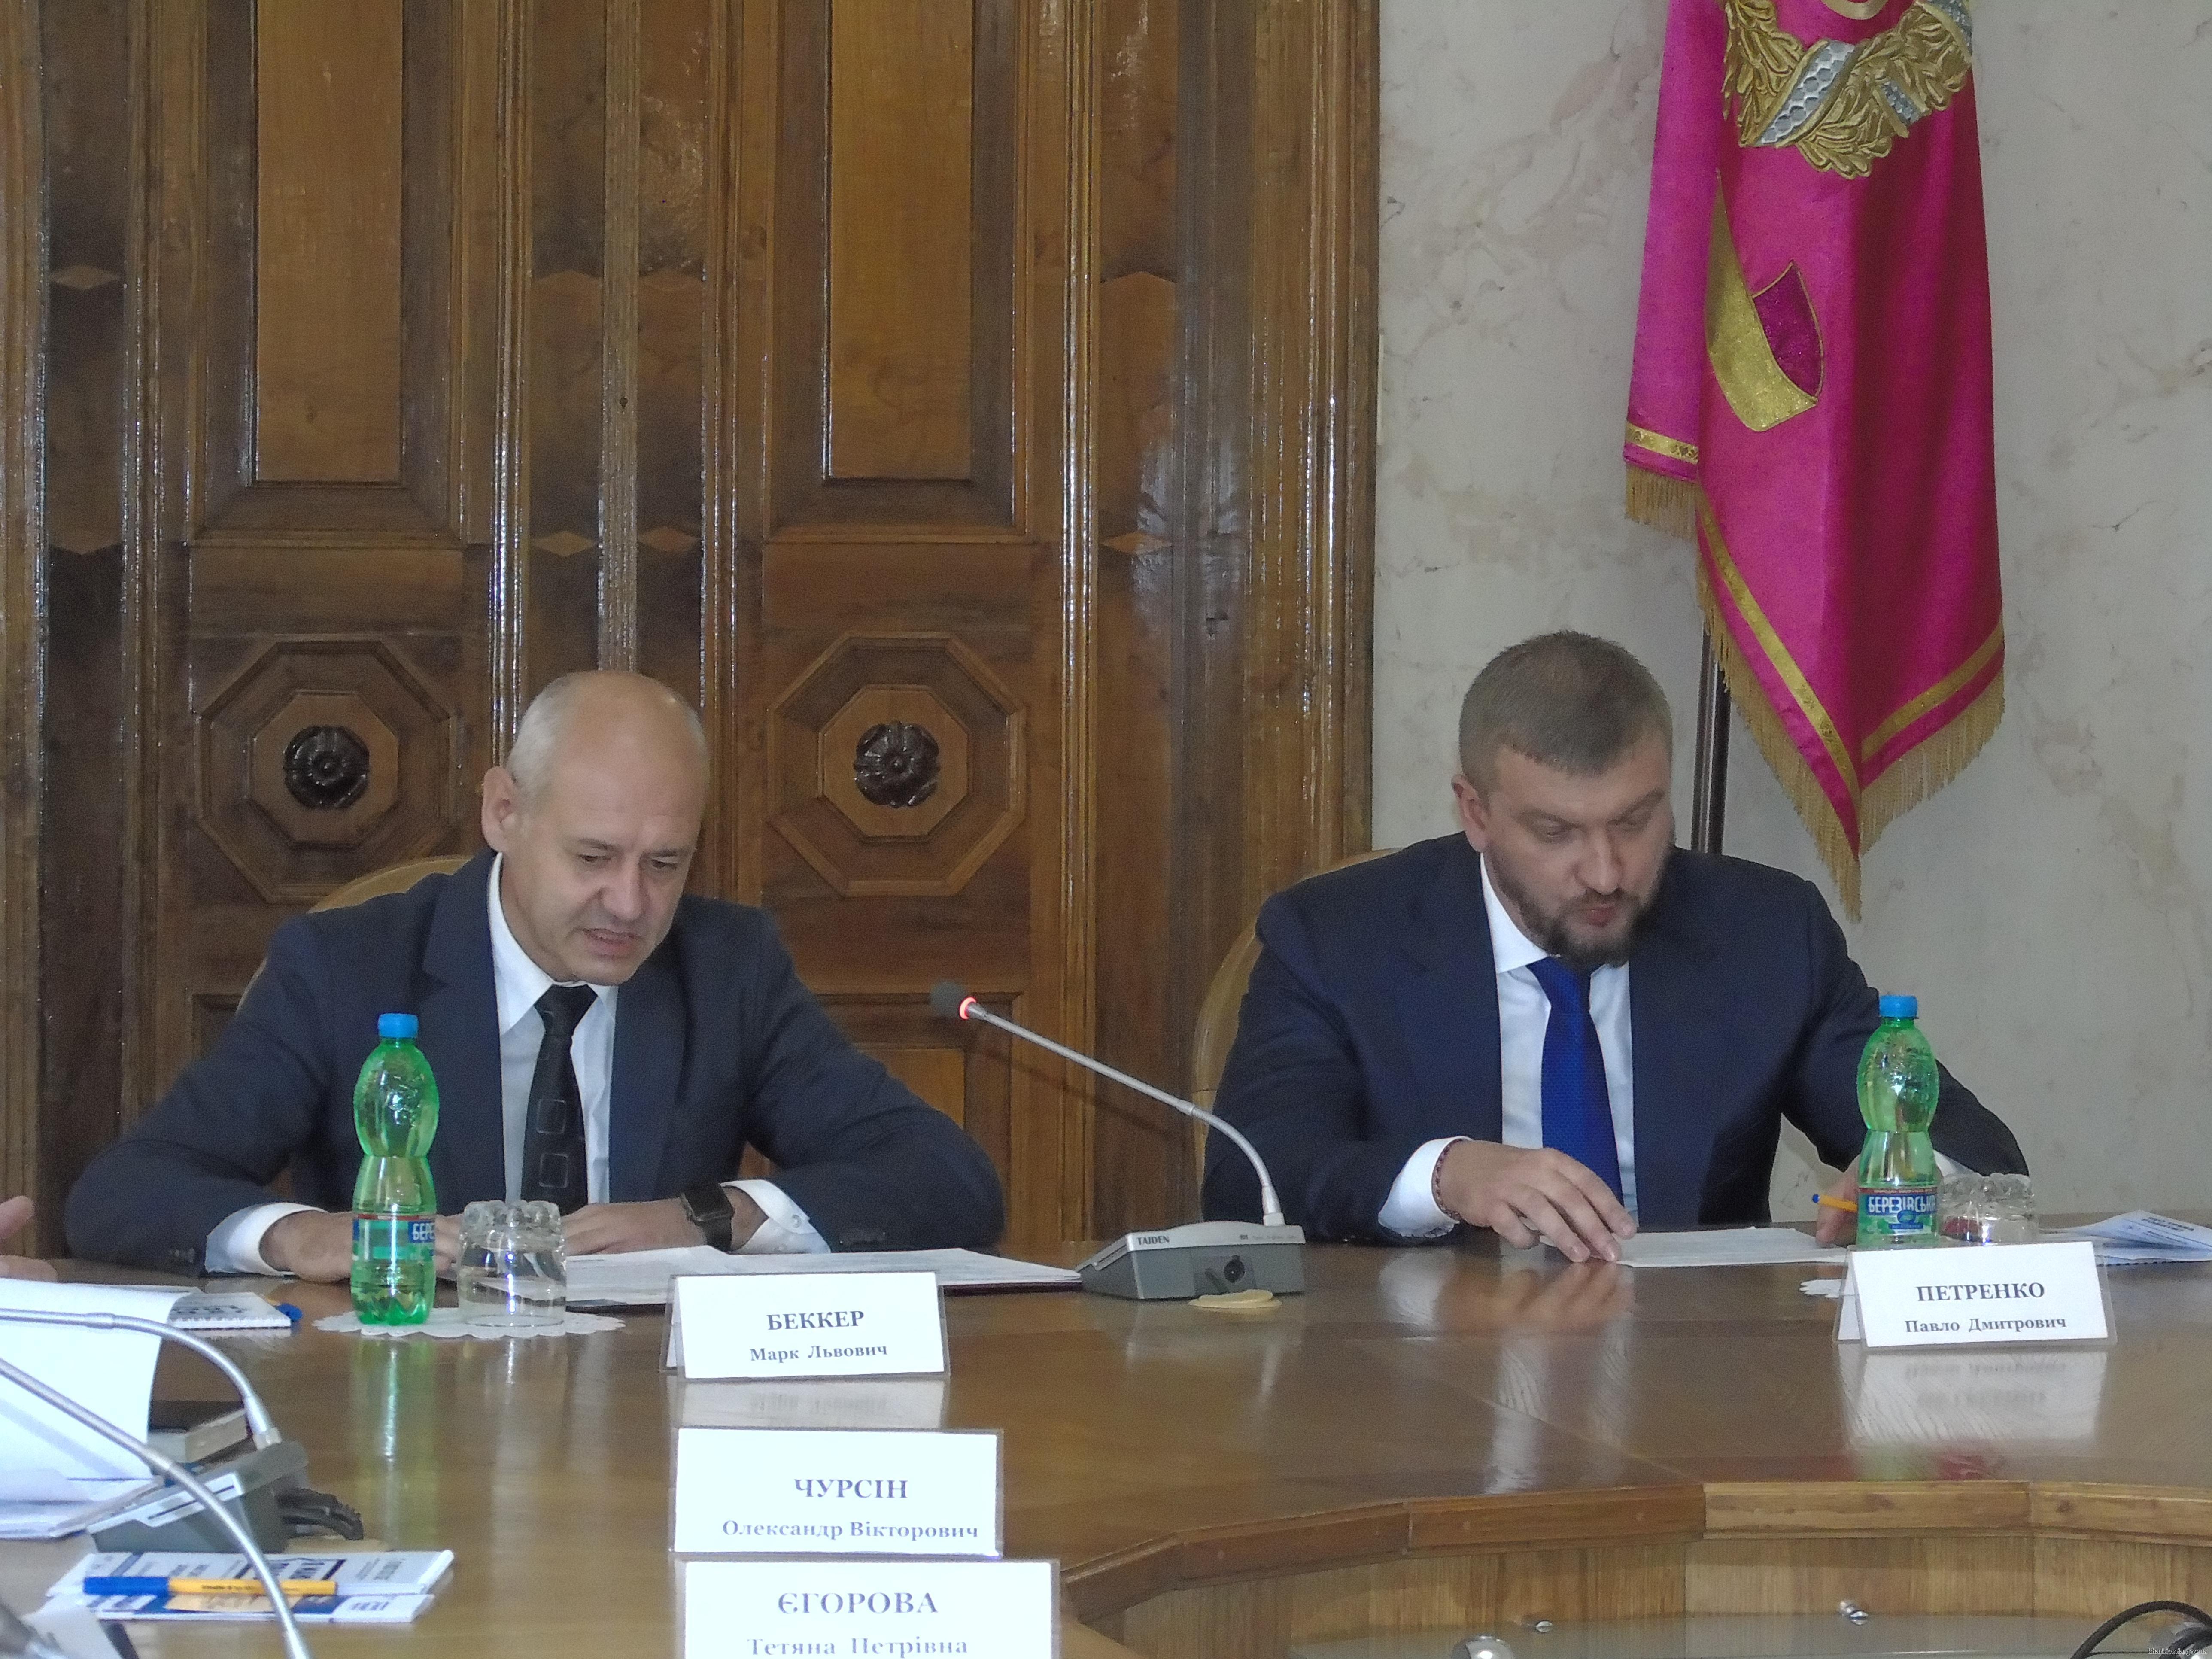 Министр юстиции поблагодарил ХОГА за эффективную и слаженную работу (ФОТО)